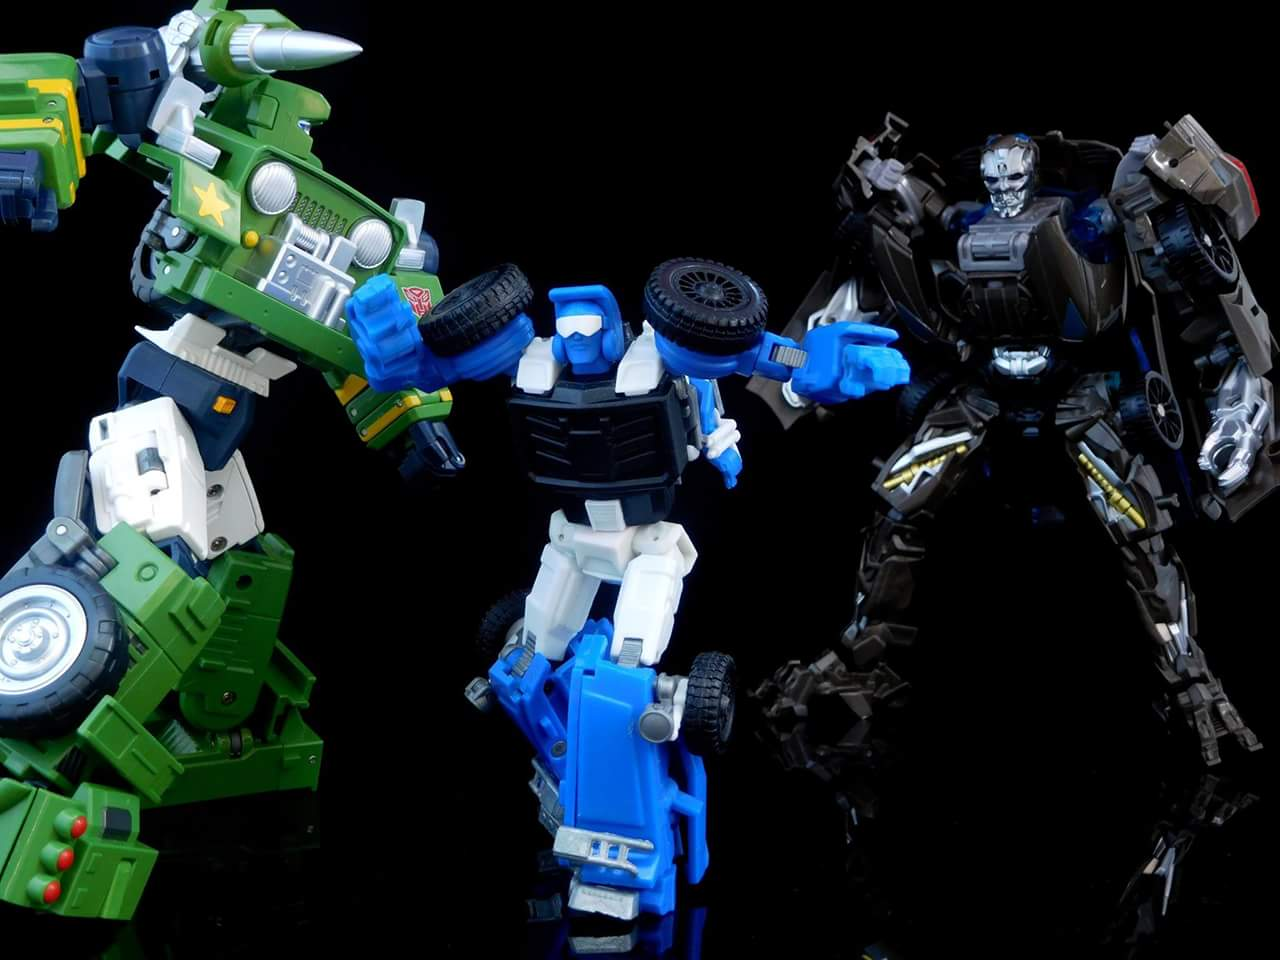 [X-Transbots] Produit Tiers - Minibots MP - Gamme MM - Page 4 T9DhQgf5